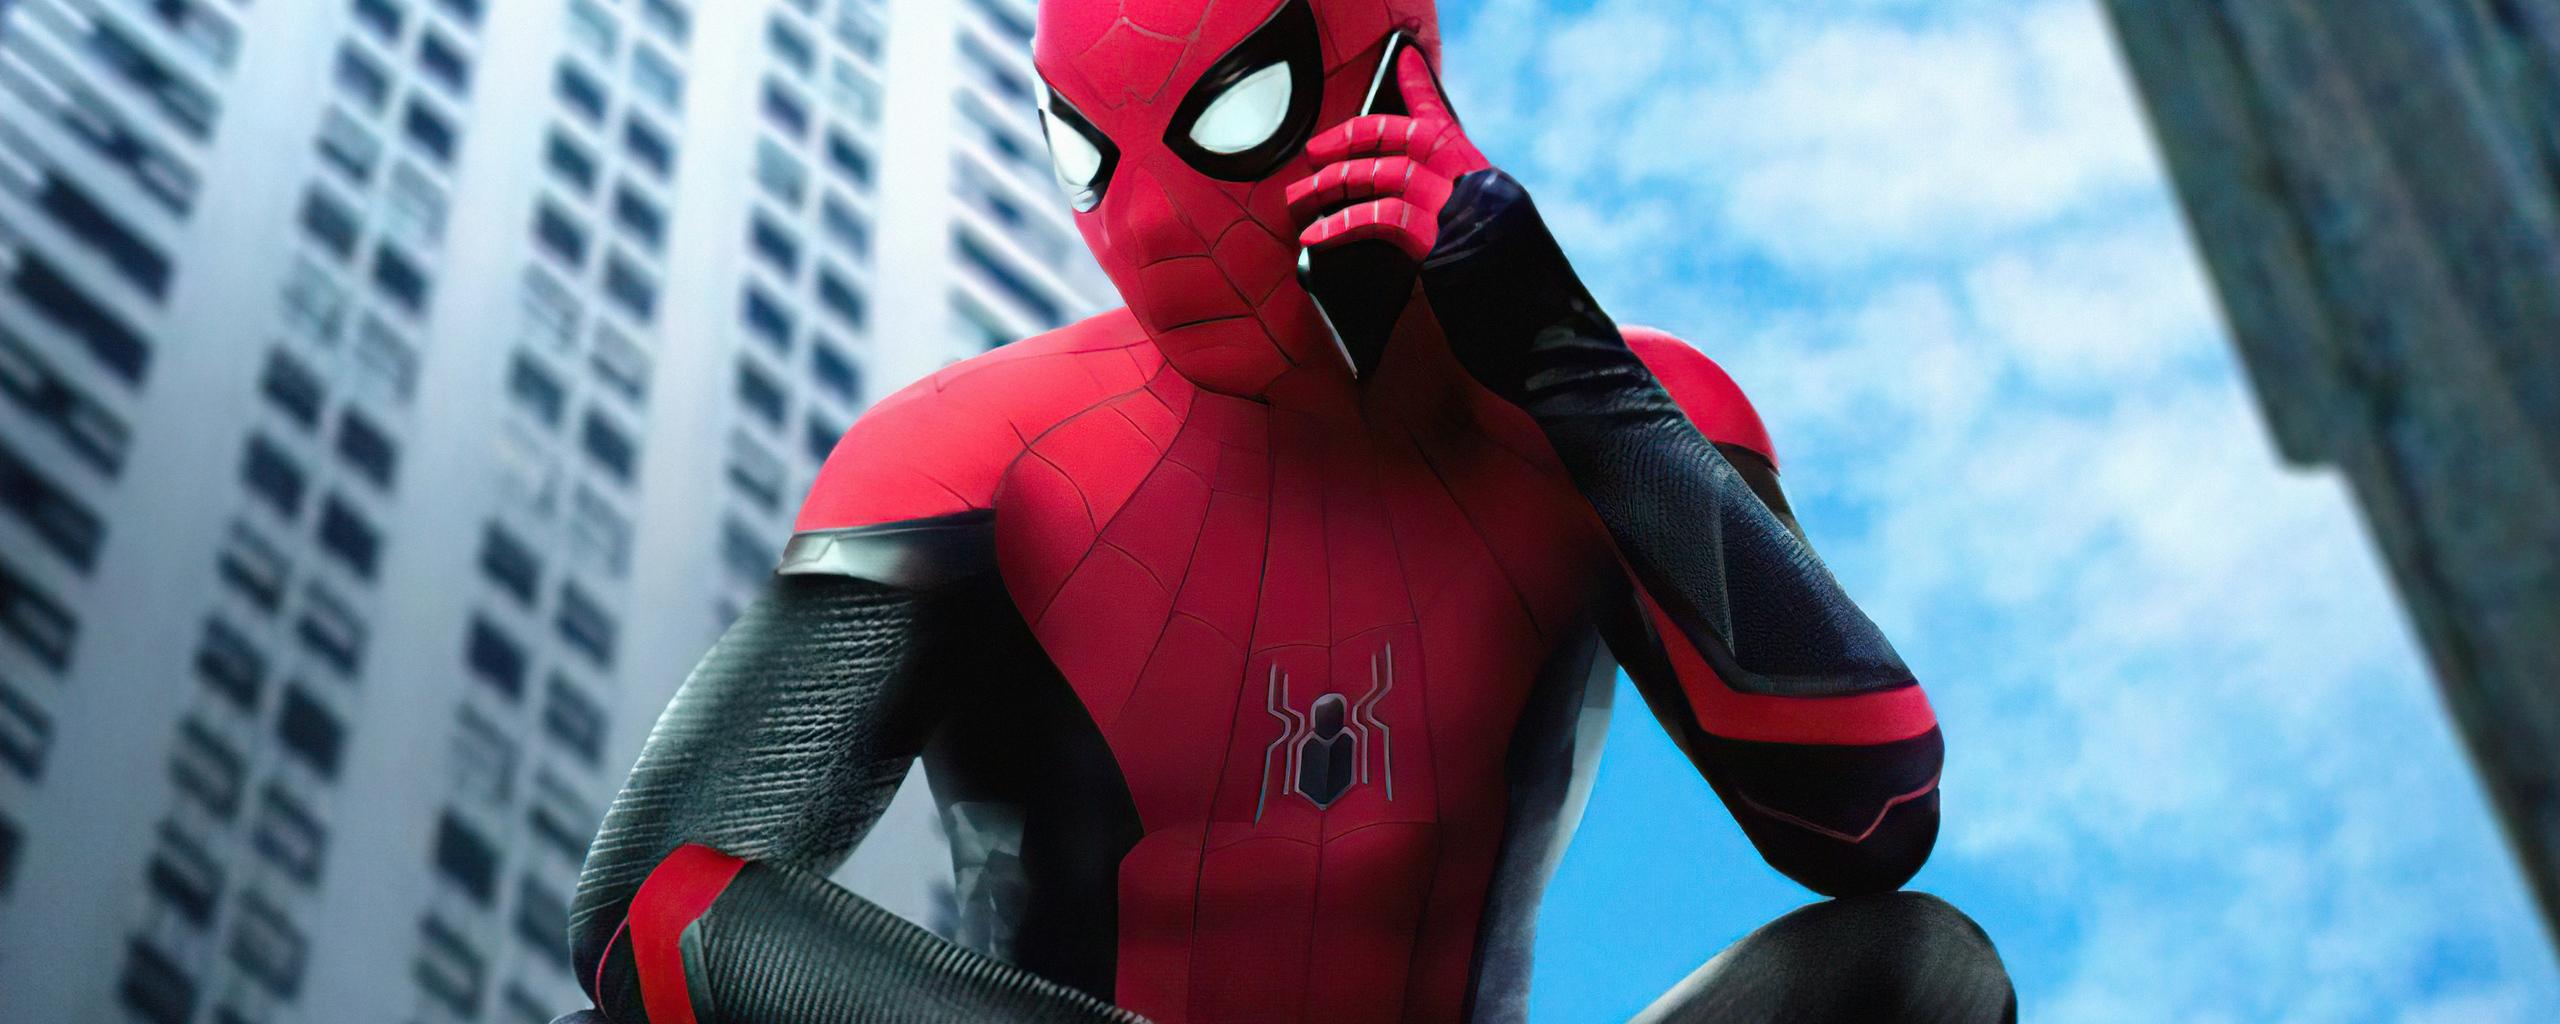 spider-man-phone-home-2021-5k-k2.jpg